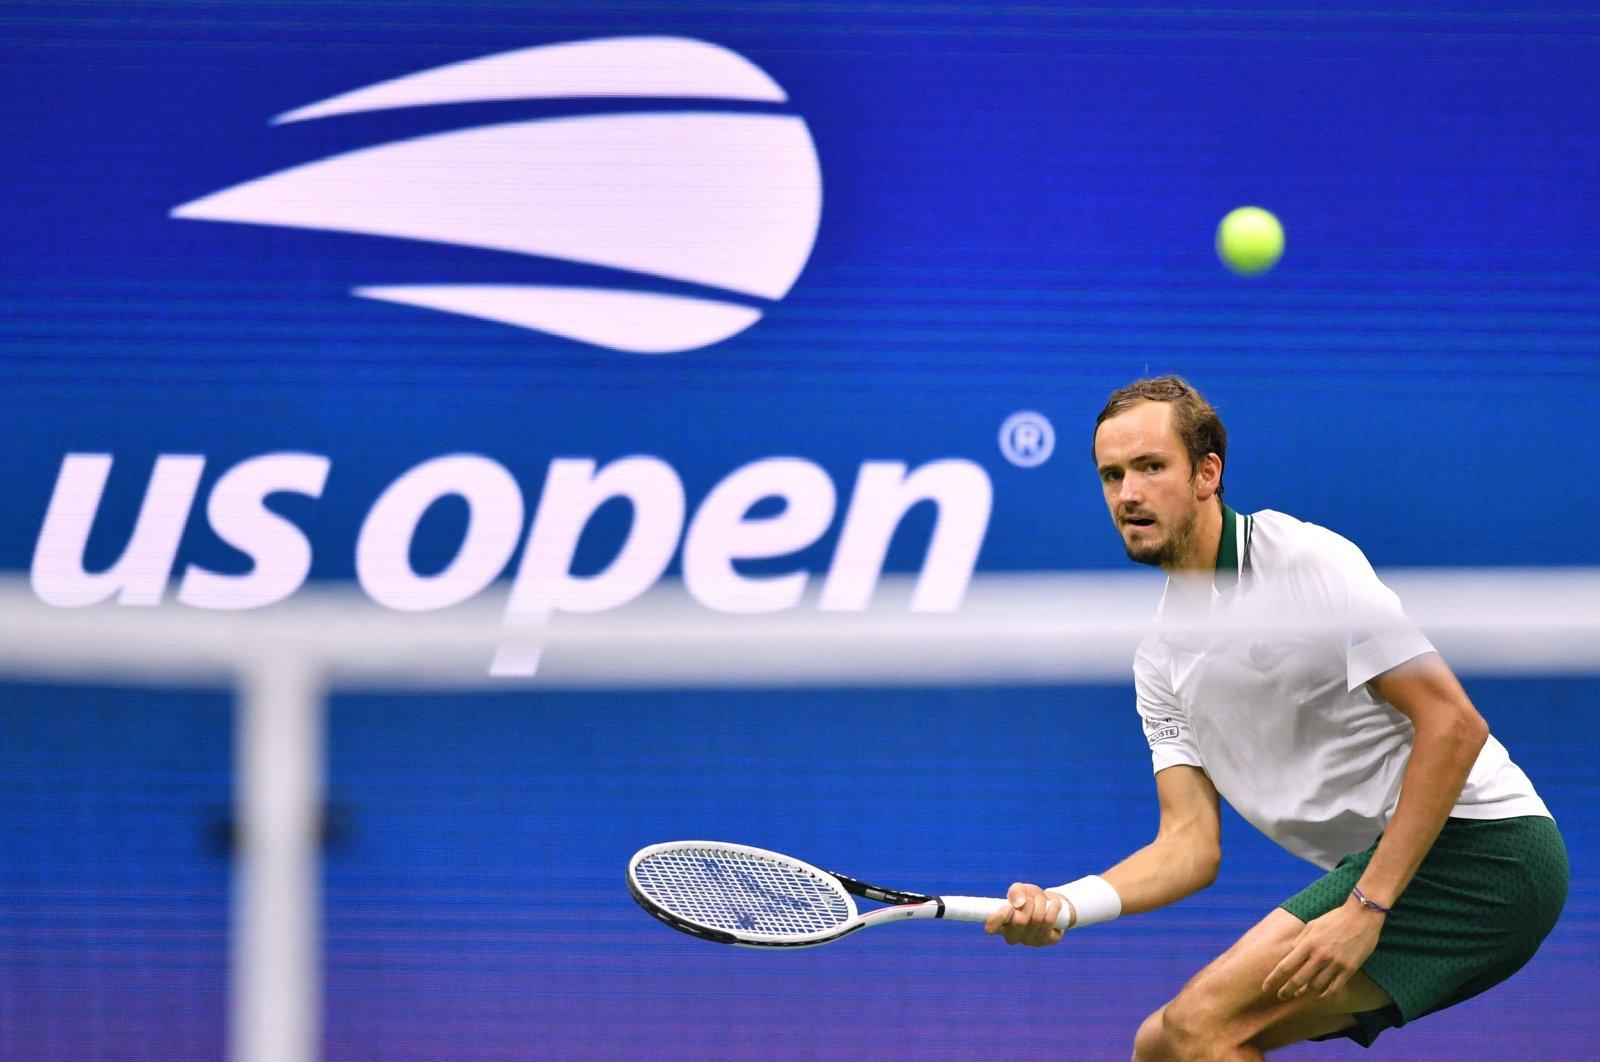 Russia's Daniil Medvedev hits a return to Britain's Daniel Evans during their 2021 U.S. Open Tennis men's singles fourth-round match, New York, U.S., Sept. 5, 2021. (AFP Photo)